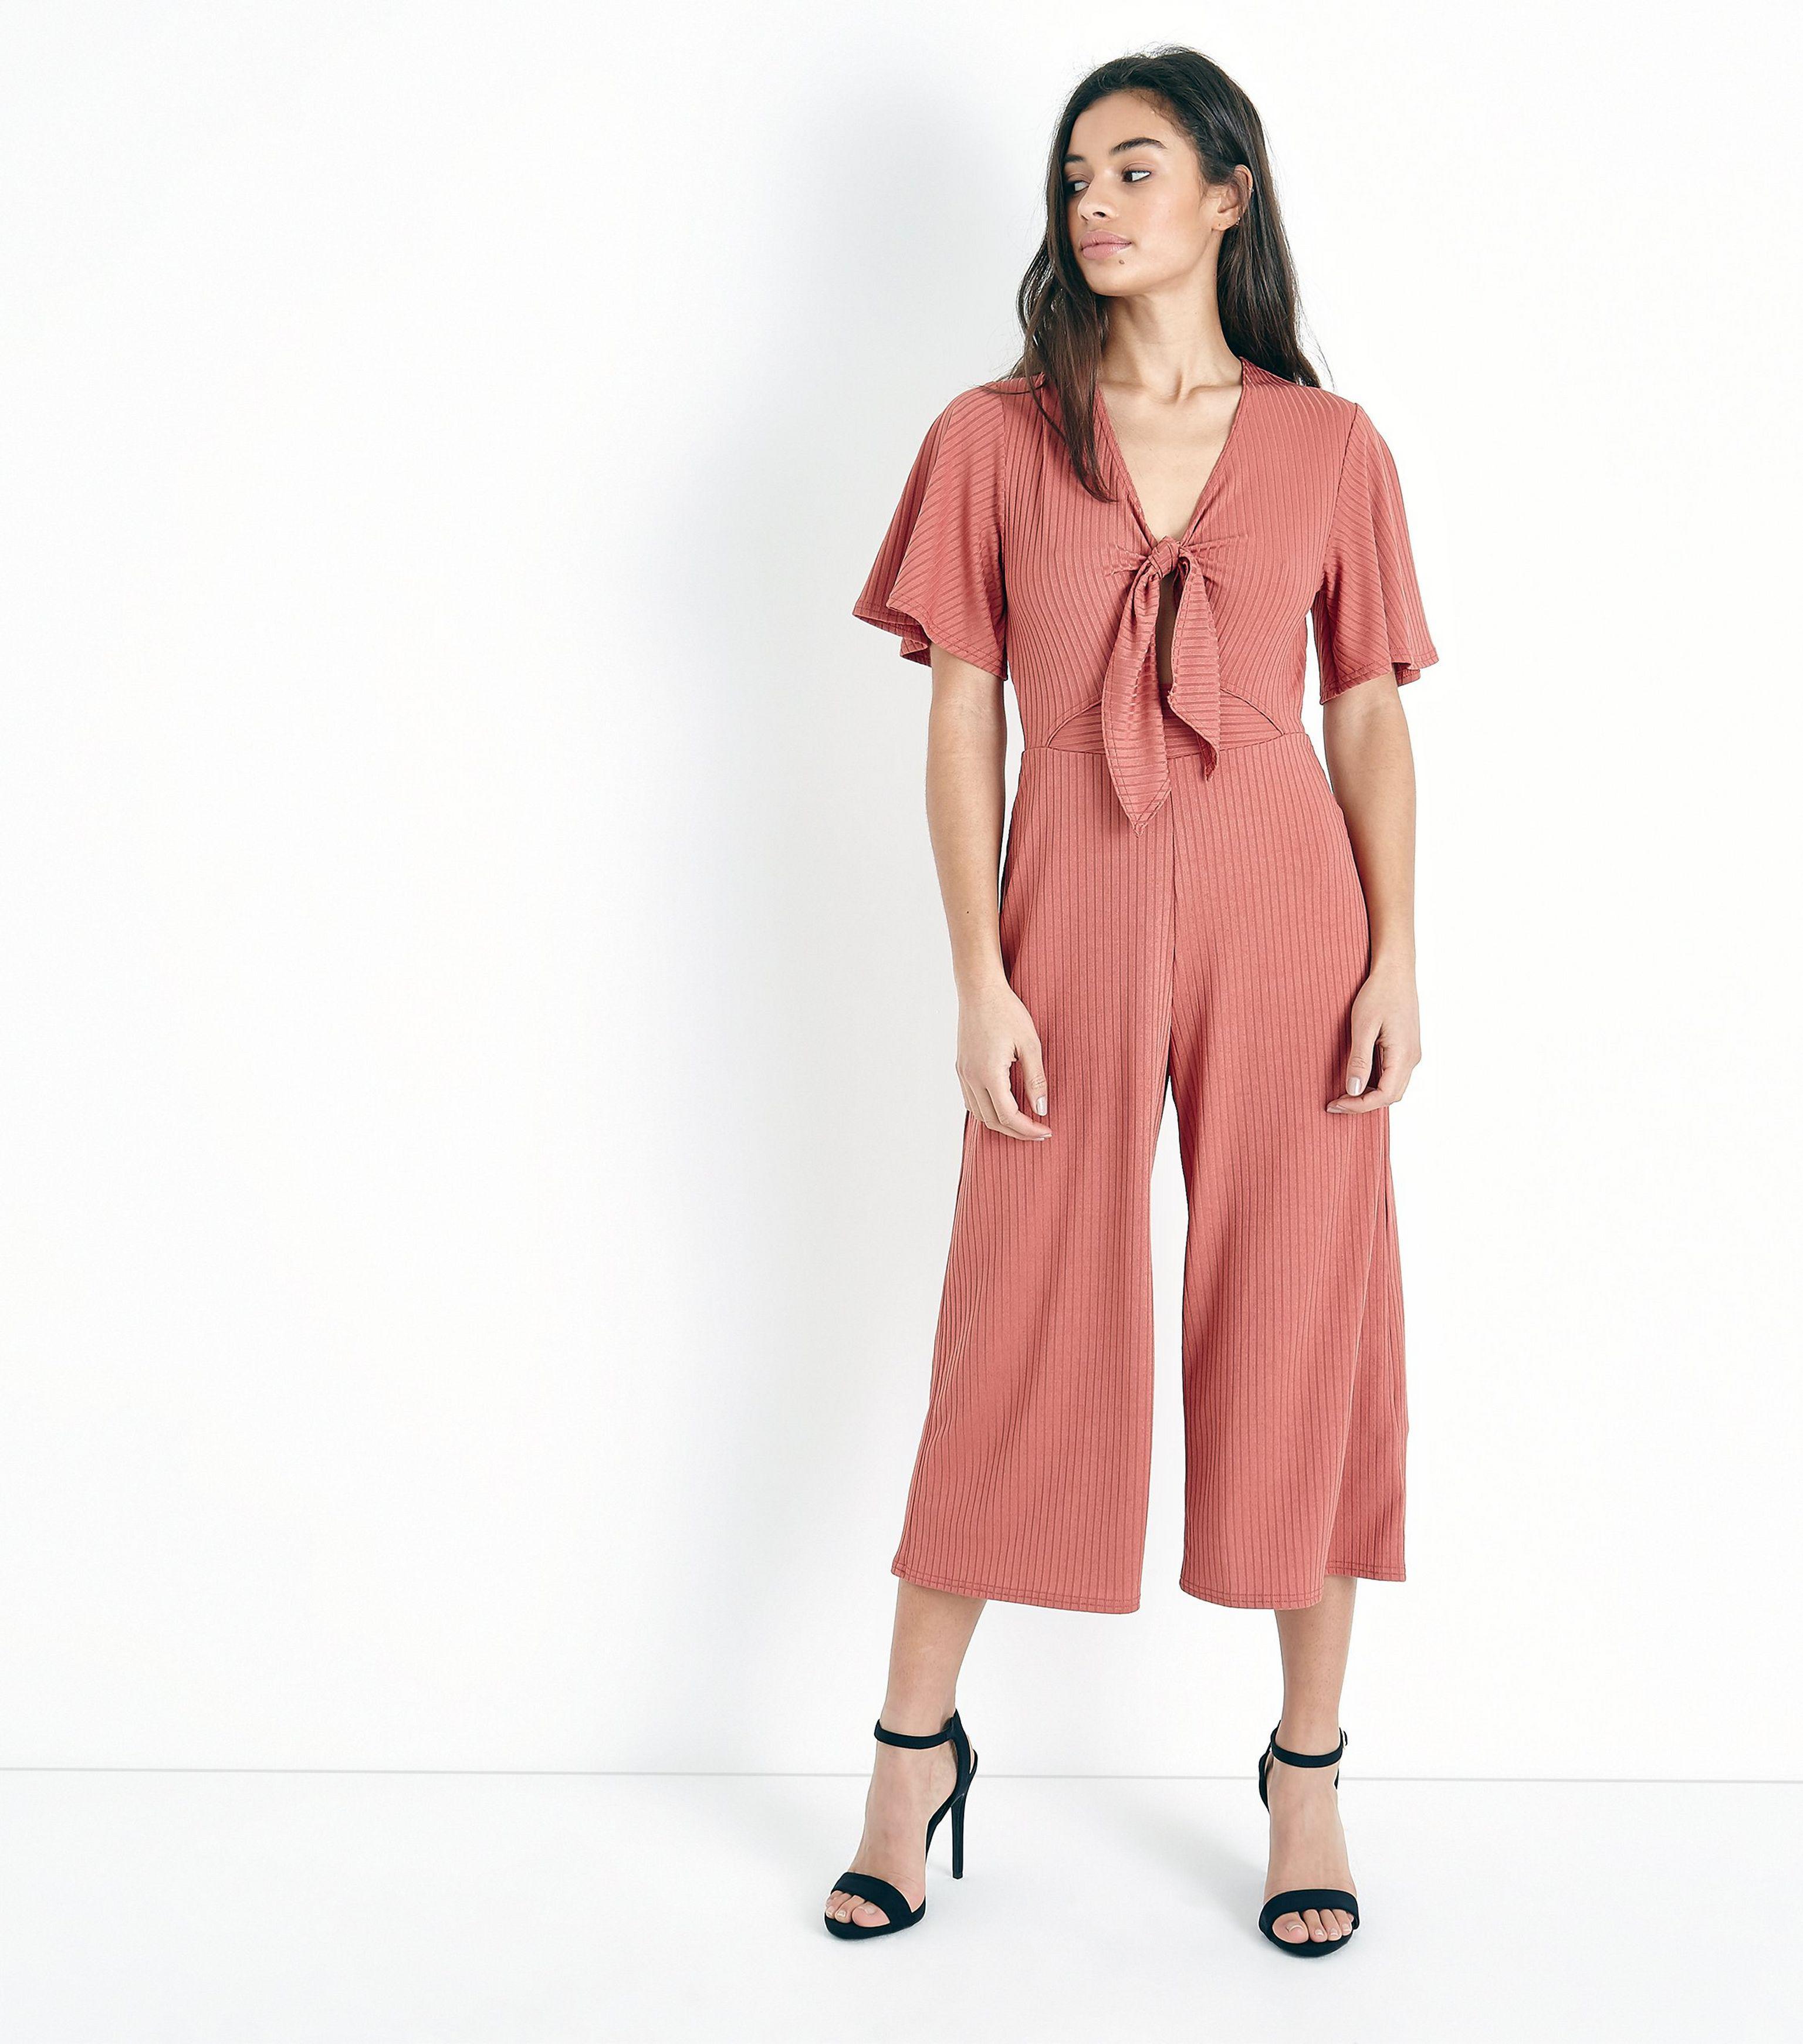 fa6b27ffb0b4 New Look Petite Rust Tie Front Ribbed Culotte Jumpsuit - Lyst